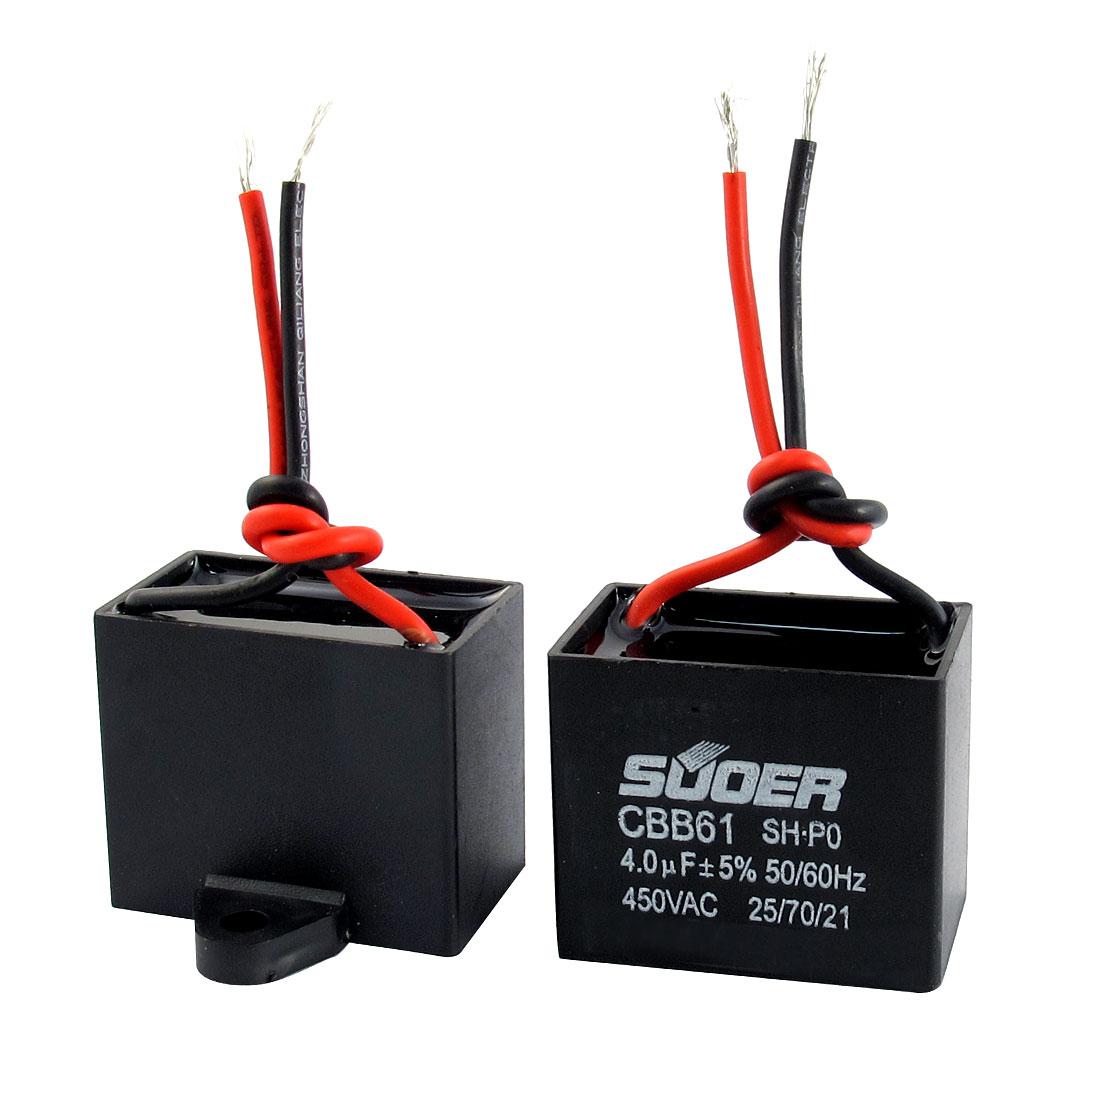 2 Pcs AC 450V 4.75uF 5% Tolerance 2 Wire Non Polar Polypropylene Film Air Condition Motor Running Capacitor Black